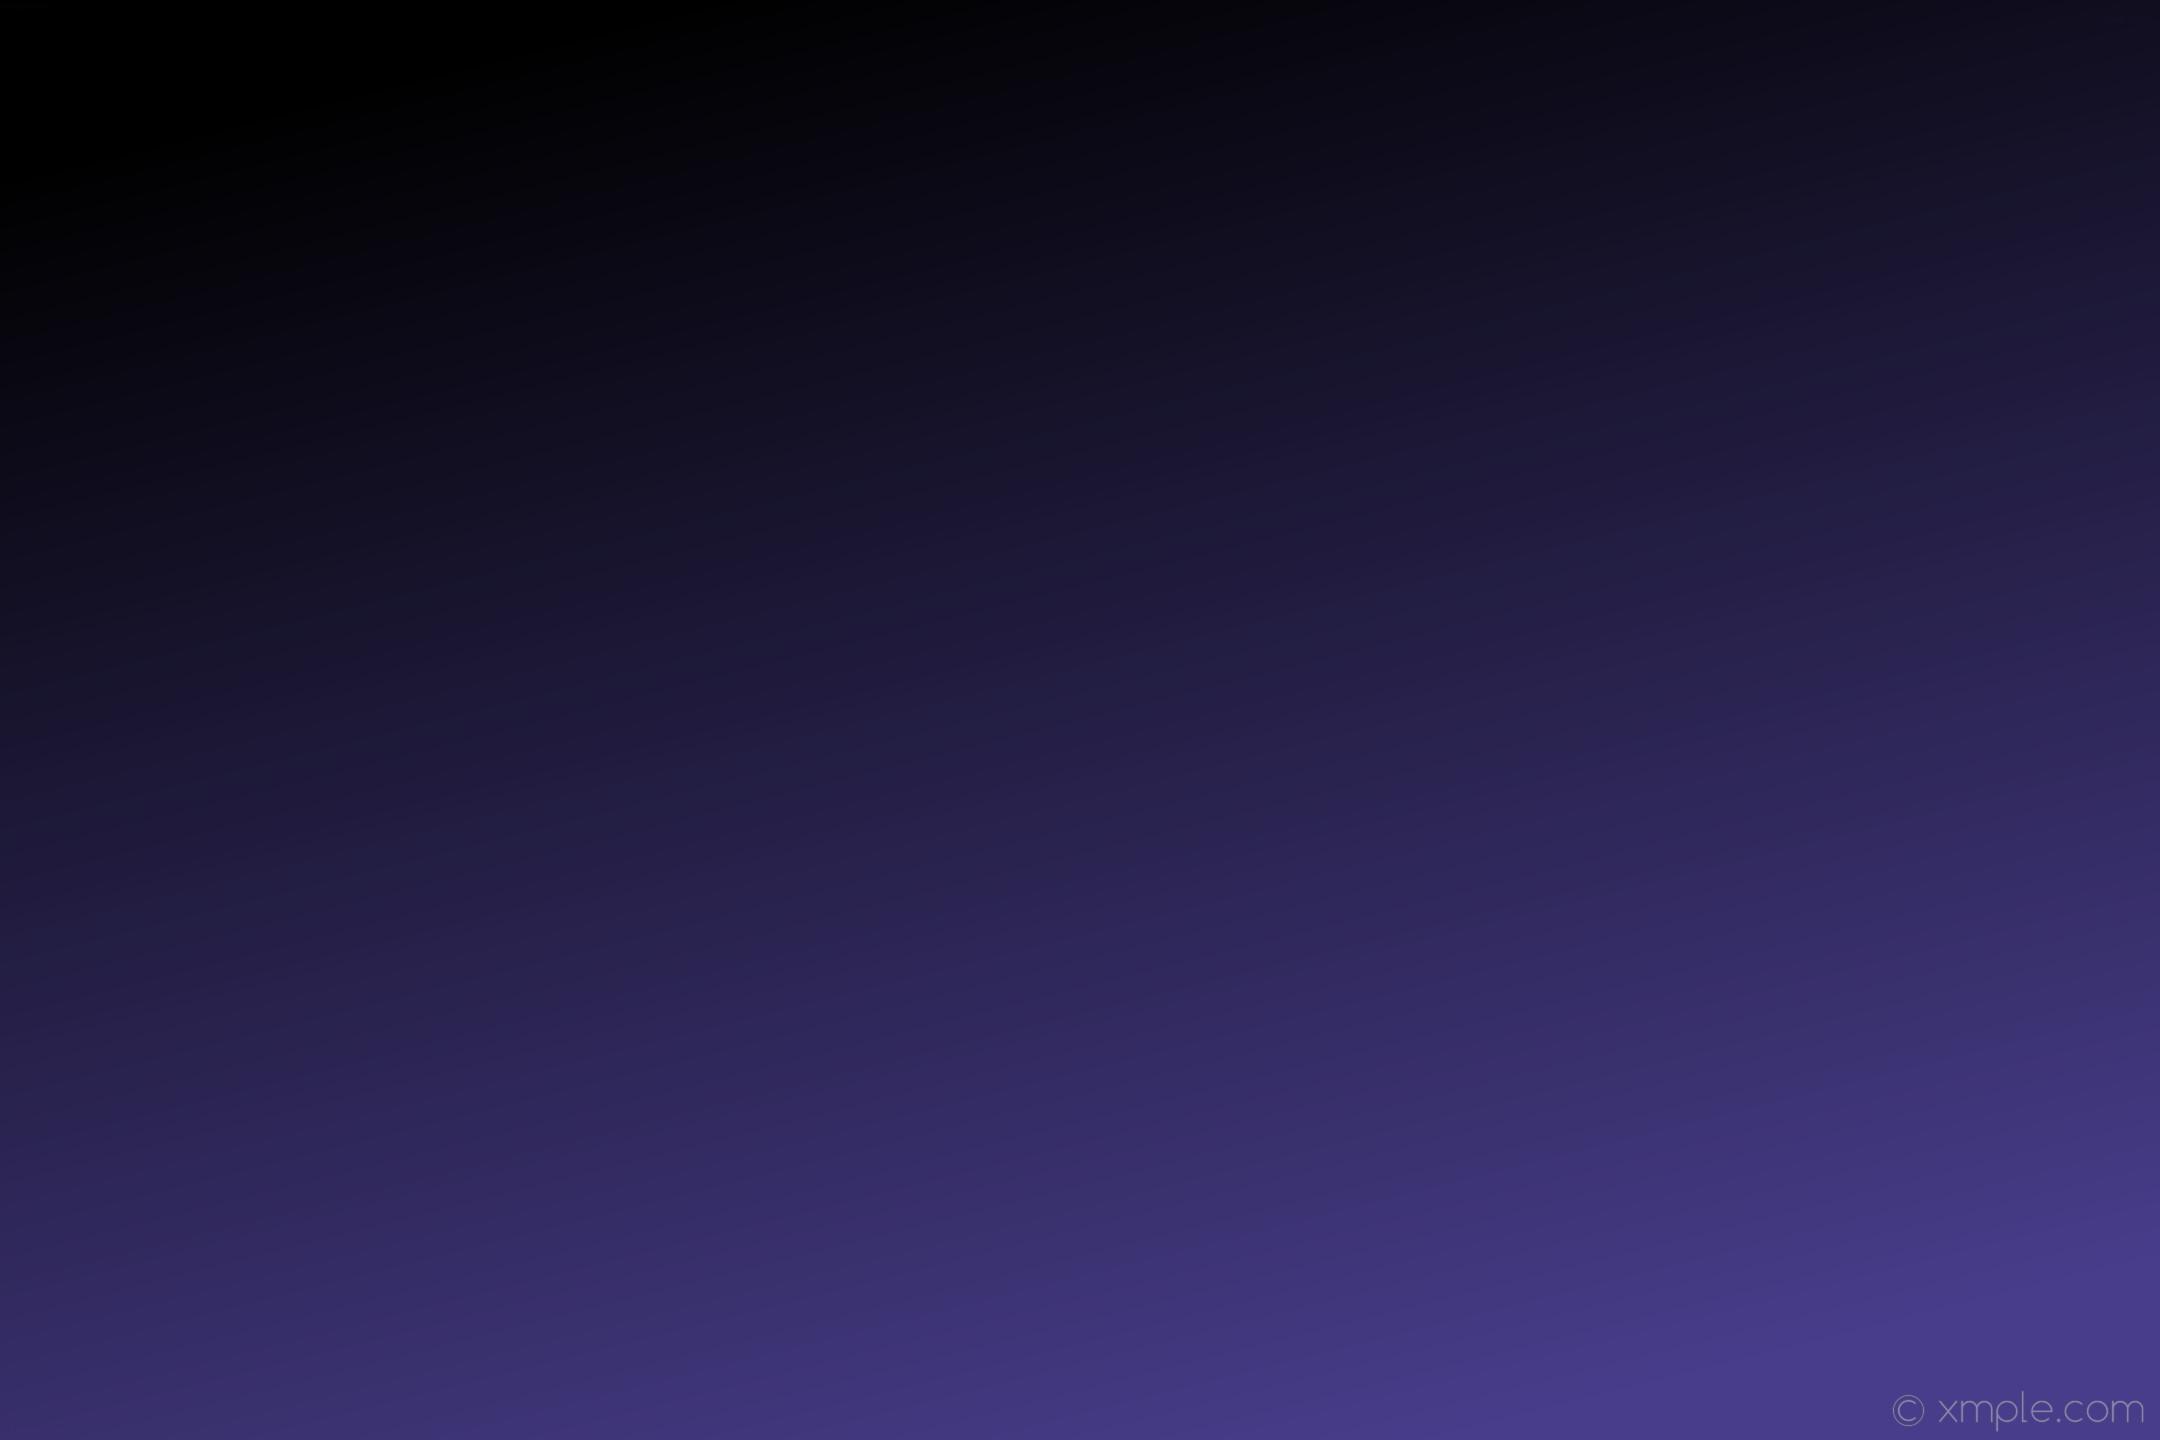 wallpaper black gradient linear purple dark slate blue #483d8b #000000 300°